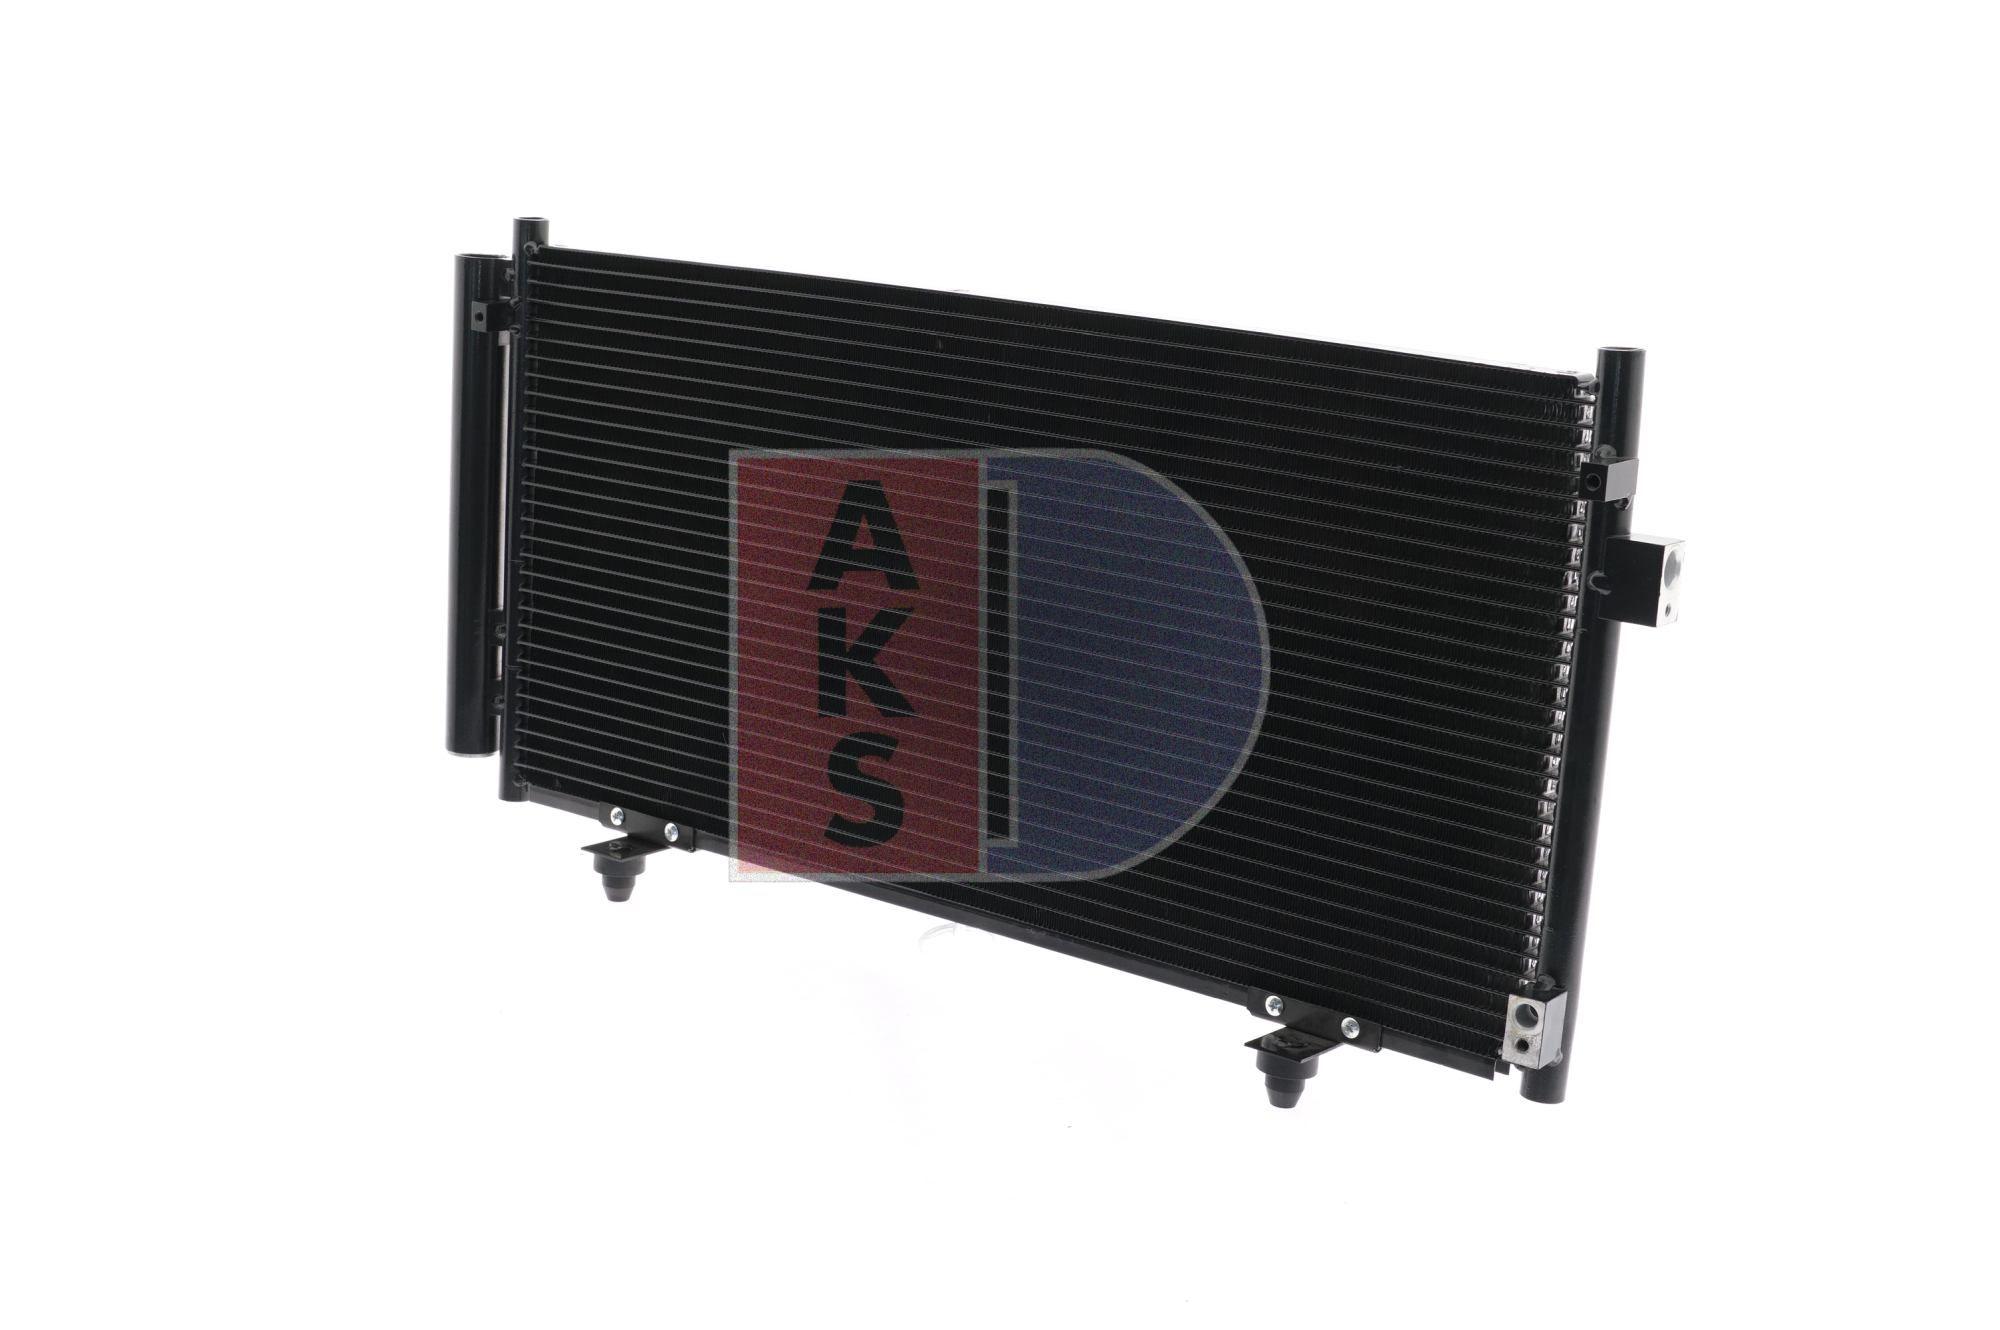 Klimakondensator 352015N AKS DASIS 352015N in Original Qualität